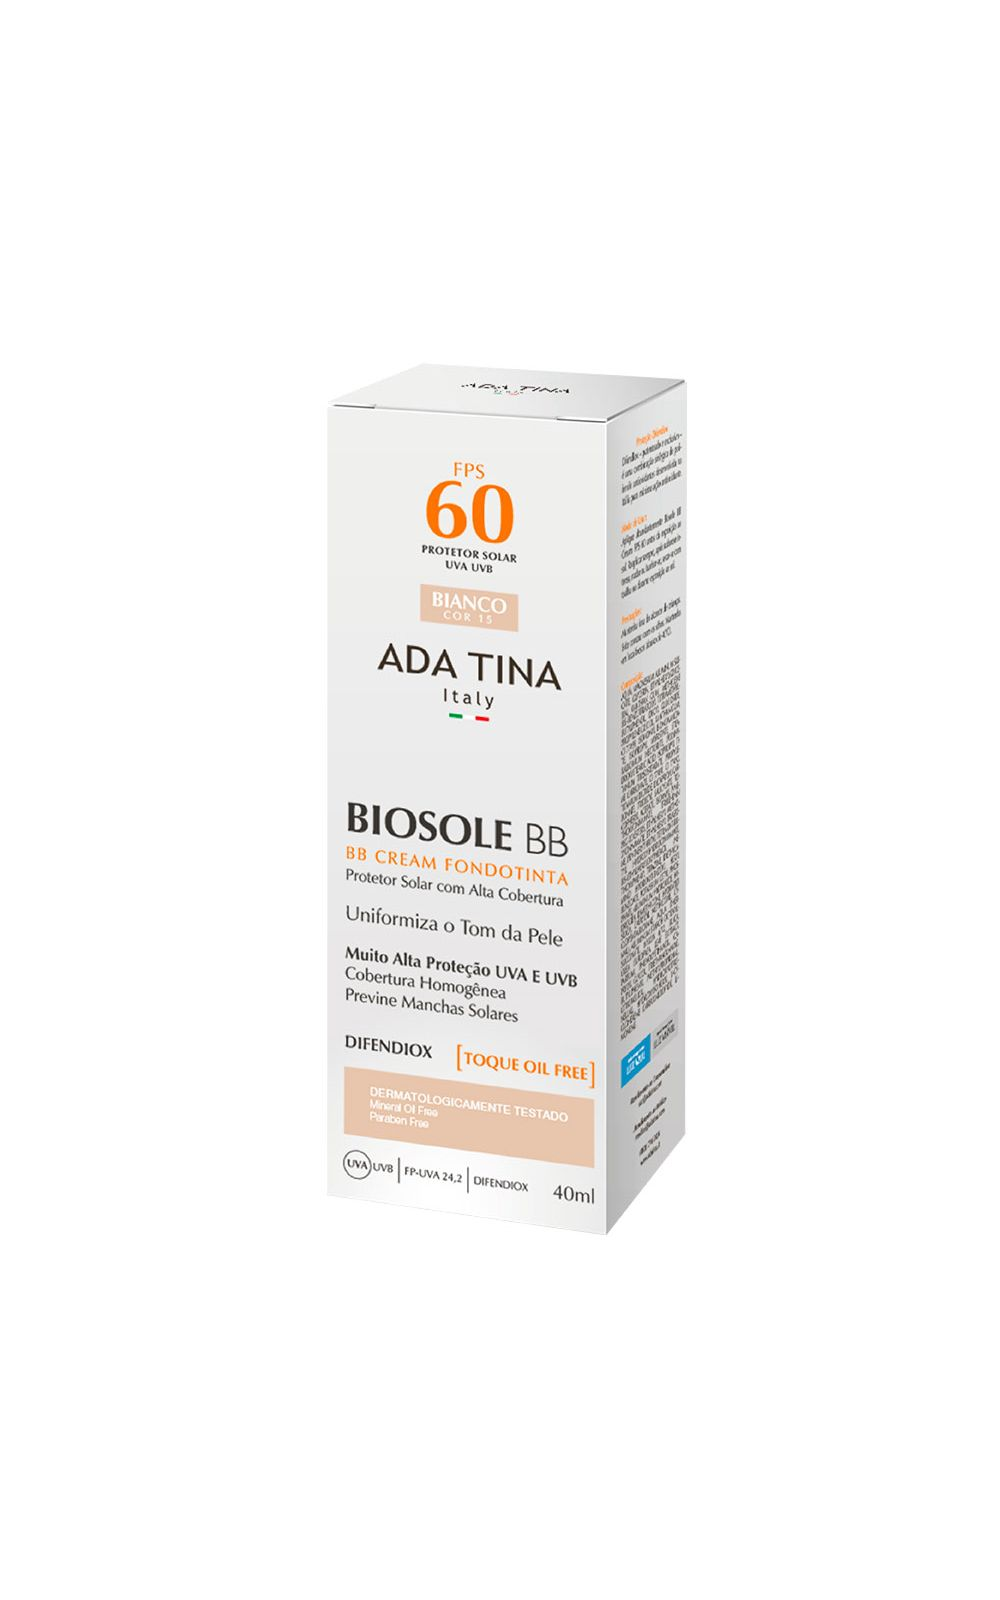 Foto 4 - Protetor Solar Anti idade Ada Tina Biosole BB Cake FPS 60 - Bianco